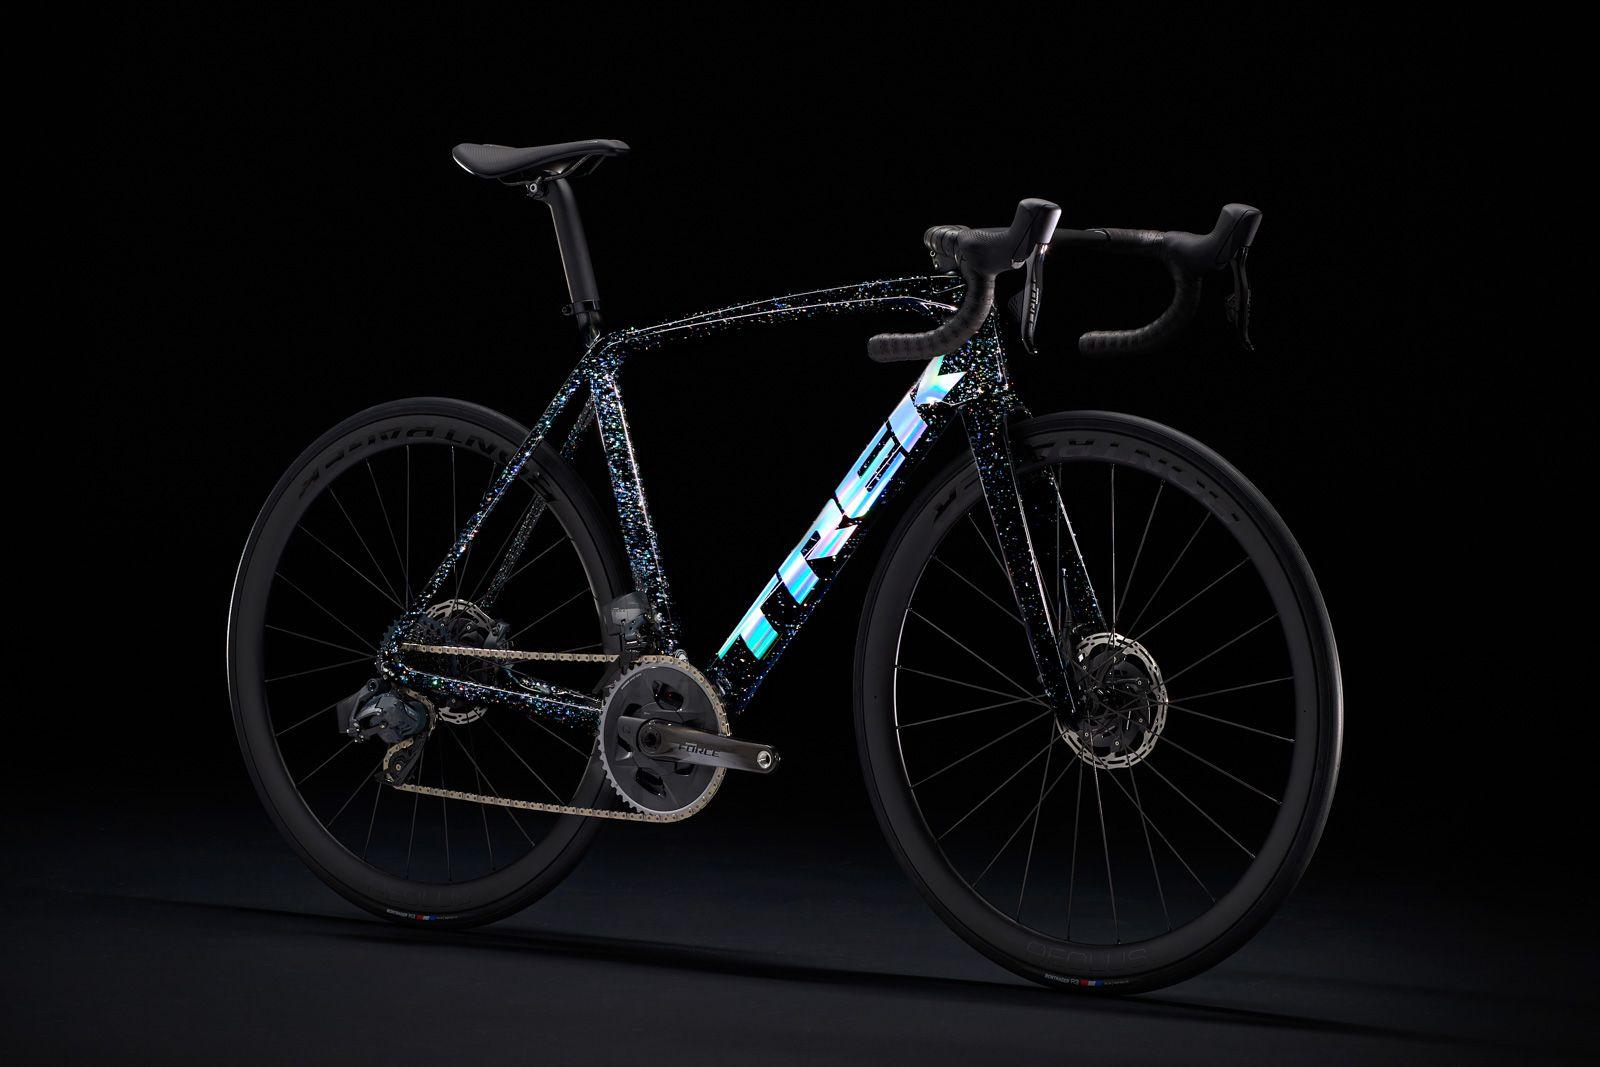 The 2021 Trek Madone Goes Under The Knife And Gets A Threaded Bottom Bracket Cyclingtips In 2020 Trek Madone Trek Beautiful Bike